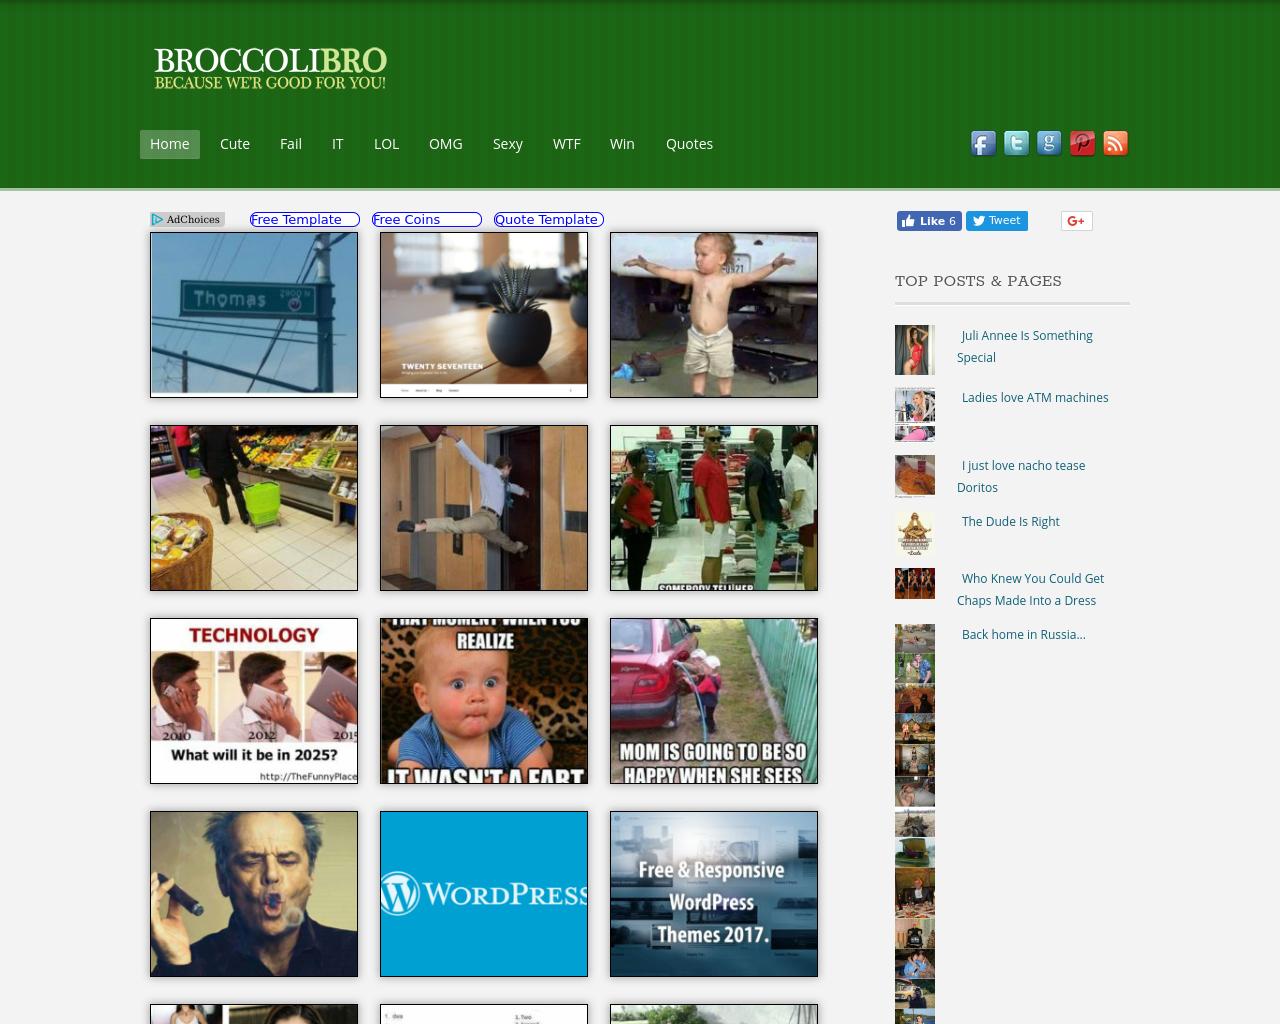 BroccoliBro-Advertising-Reviews-Pricing